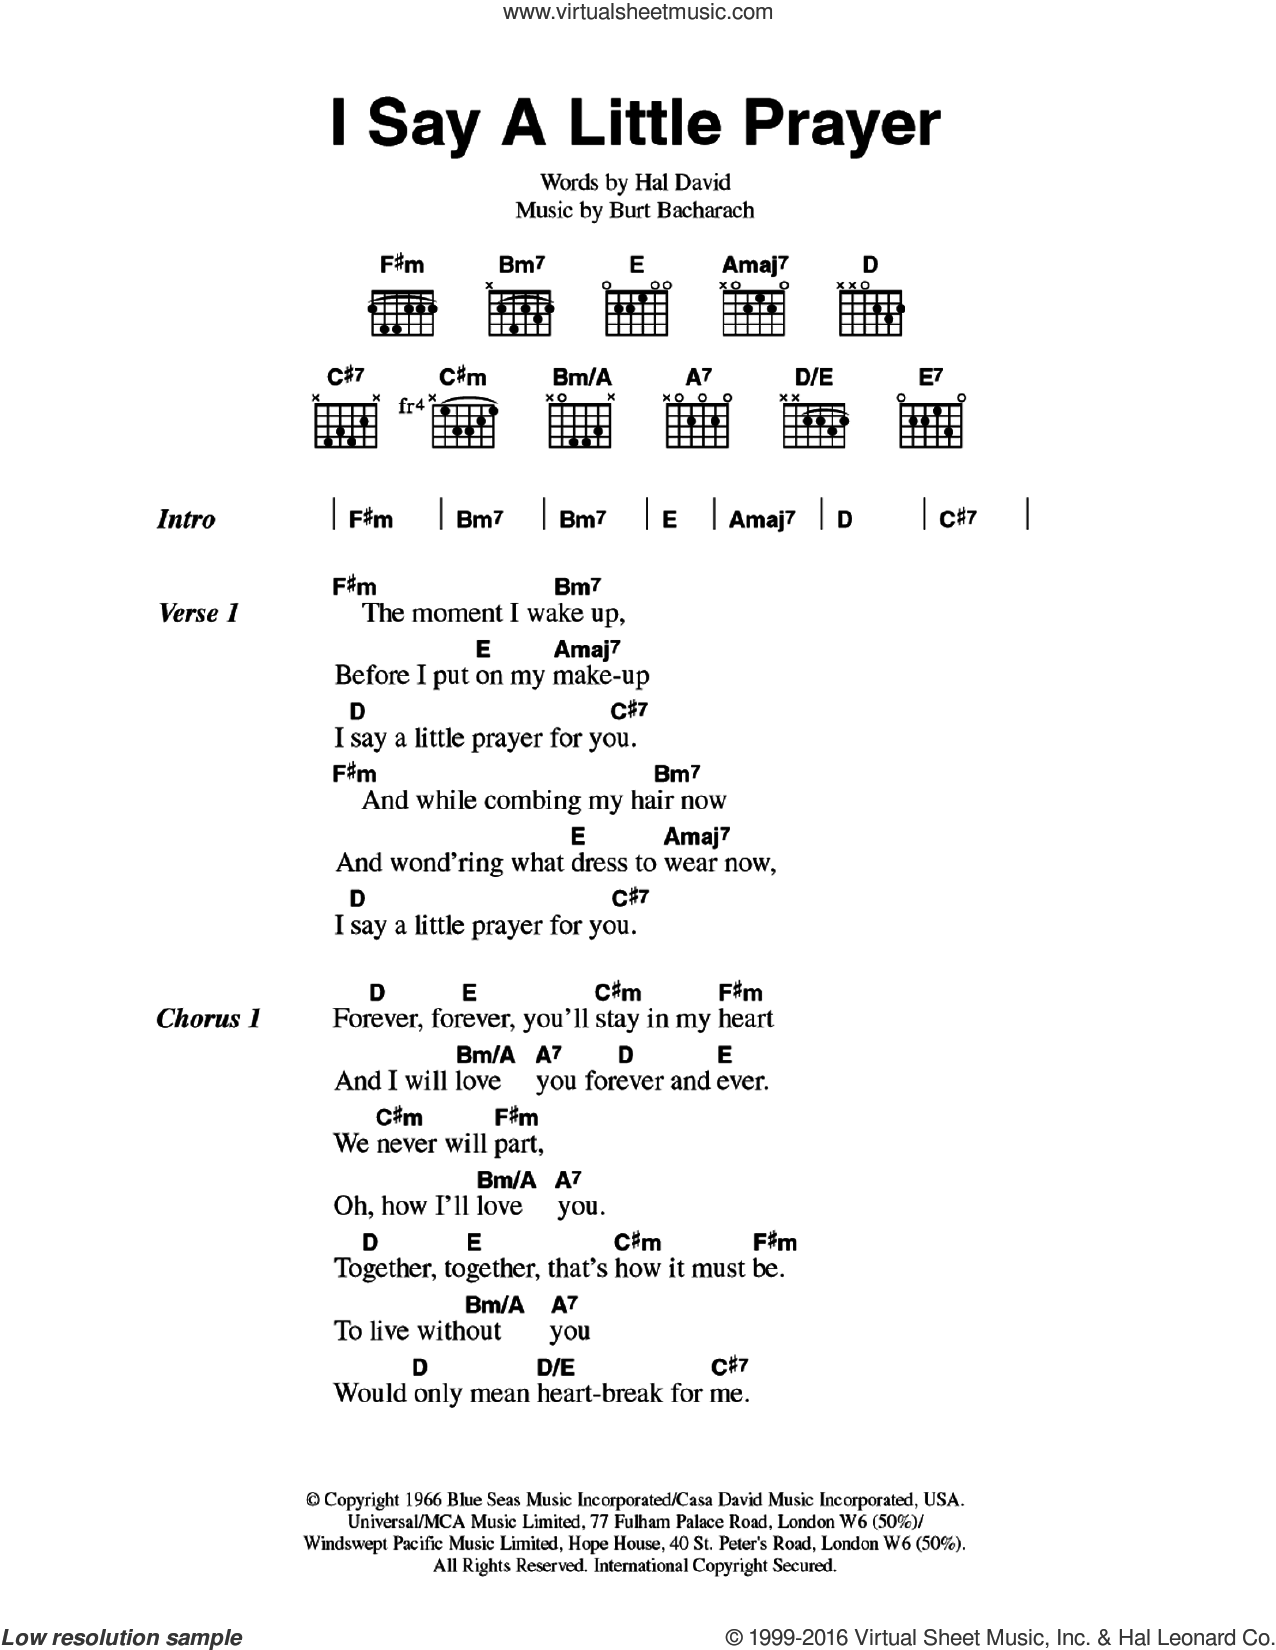 I Say A Little Prayer sheet music for guitar (chords) by Aretha Franklin, Burt Bacharach and Hal David, intermediate skill level